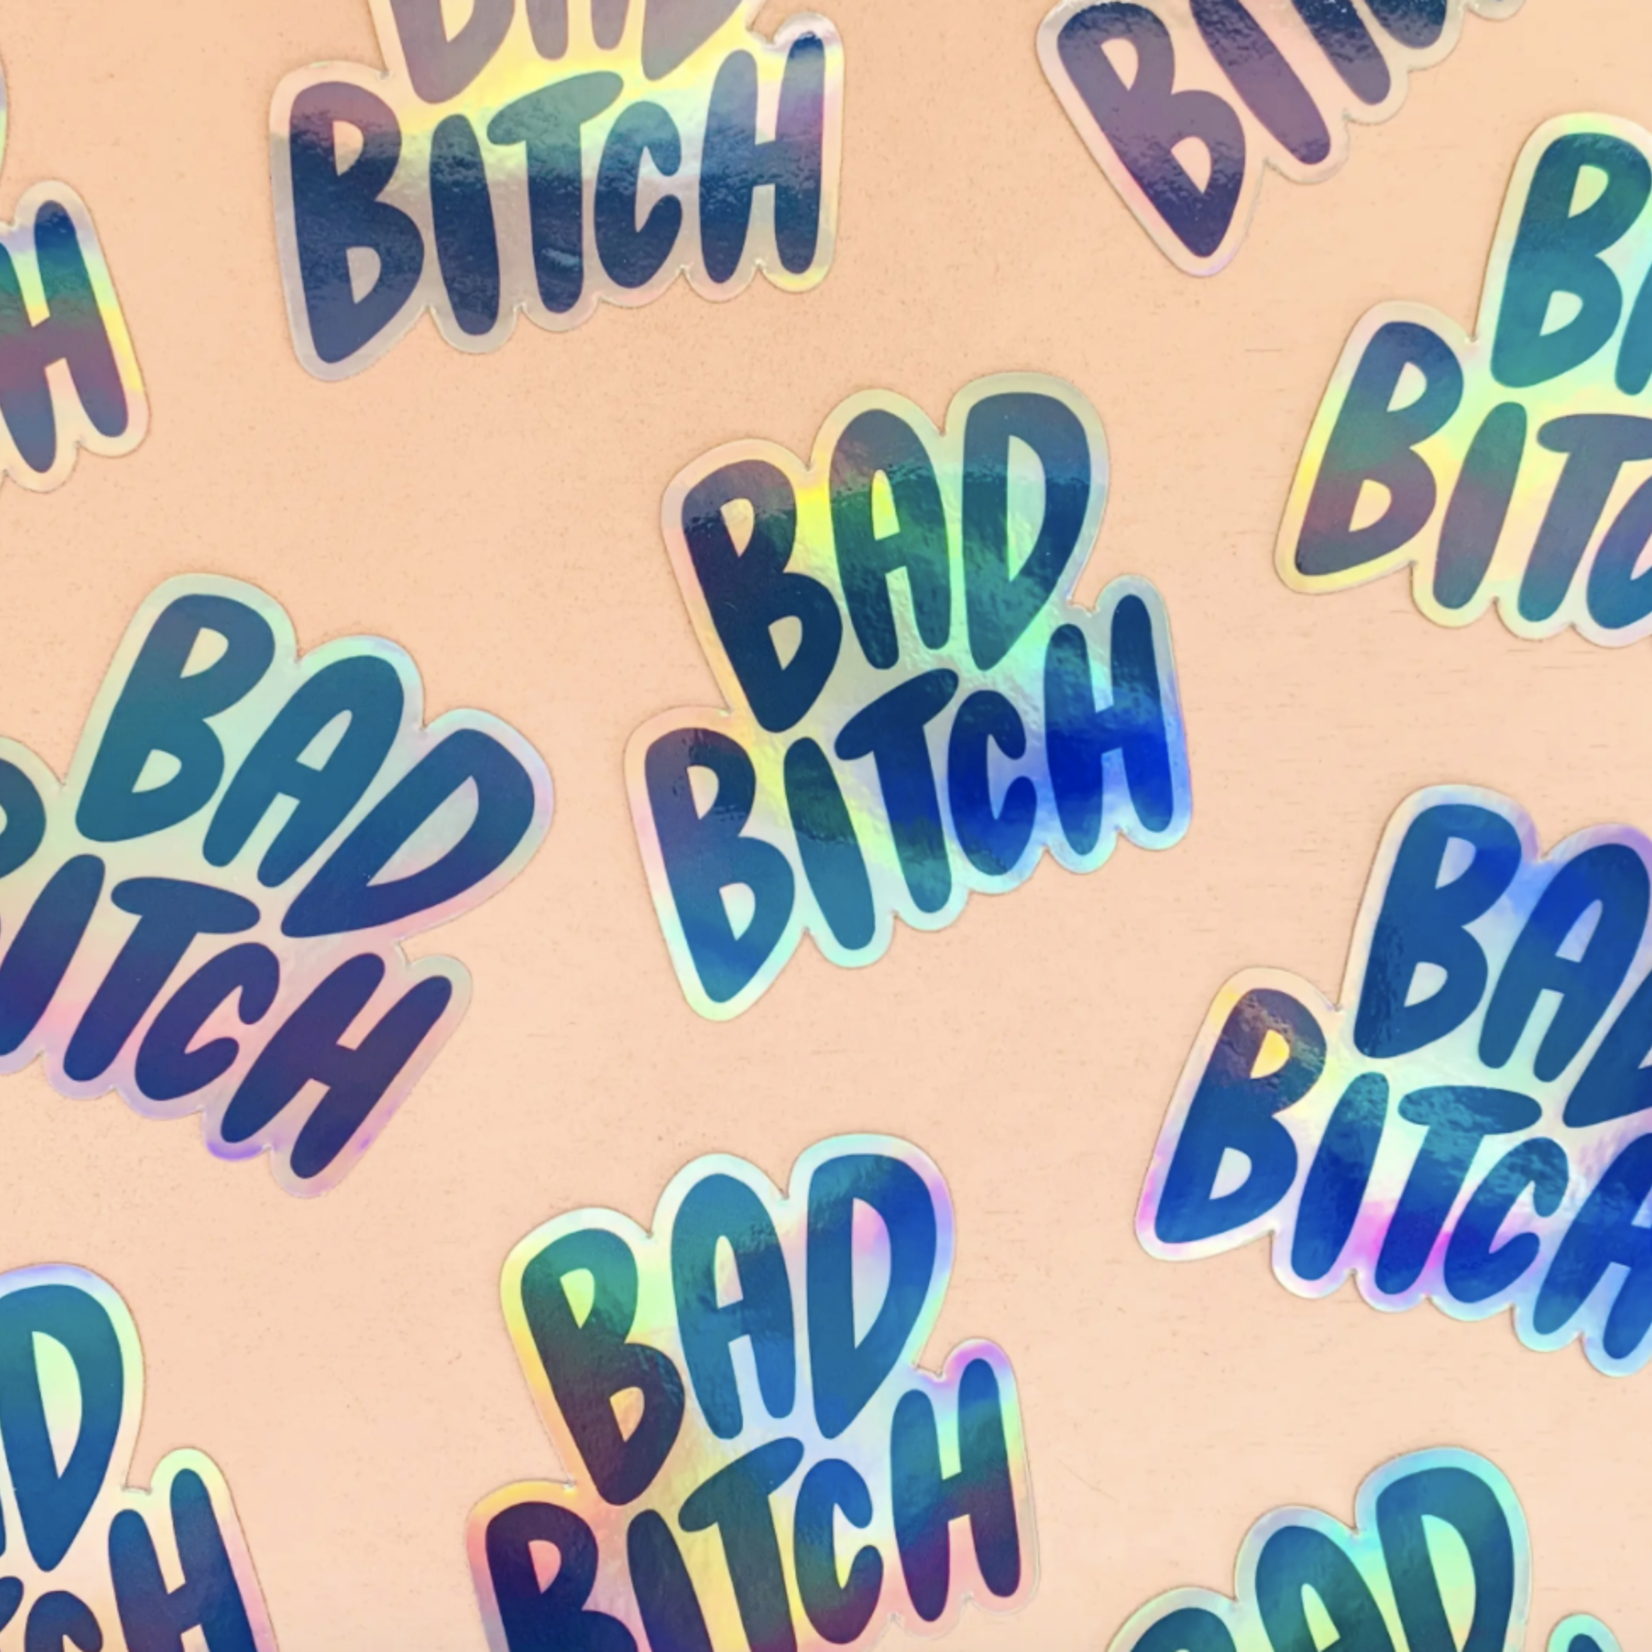 Craft Boner Bad Bitch Holographic Sticker